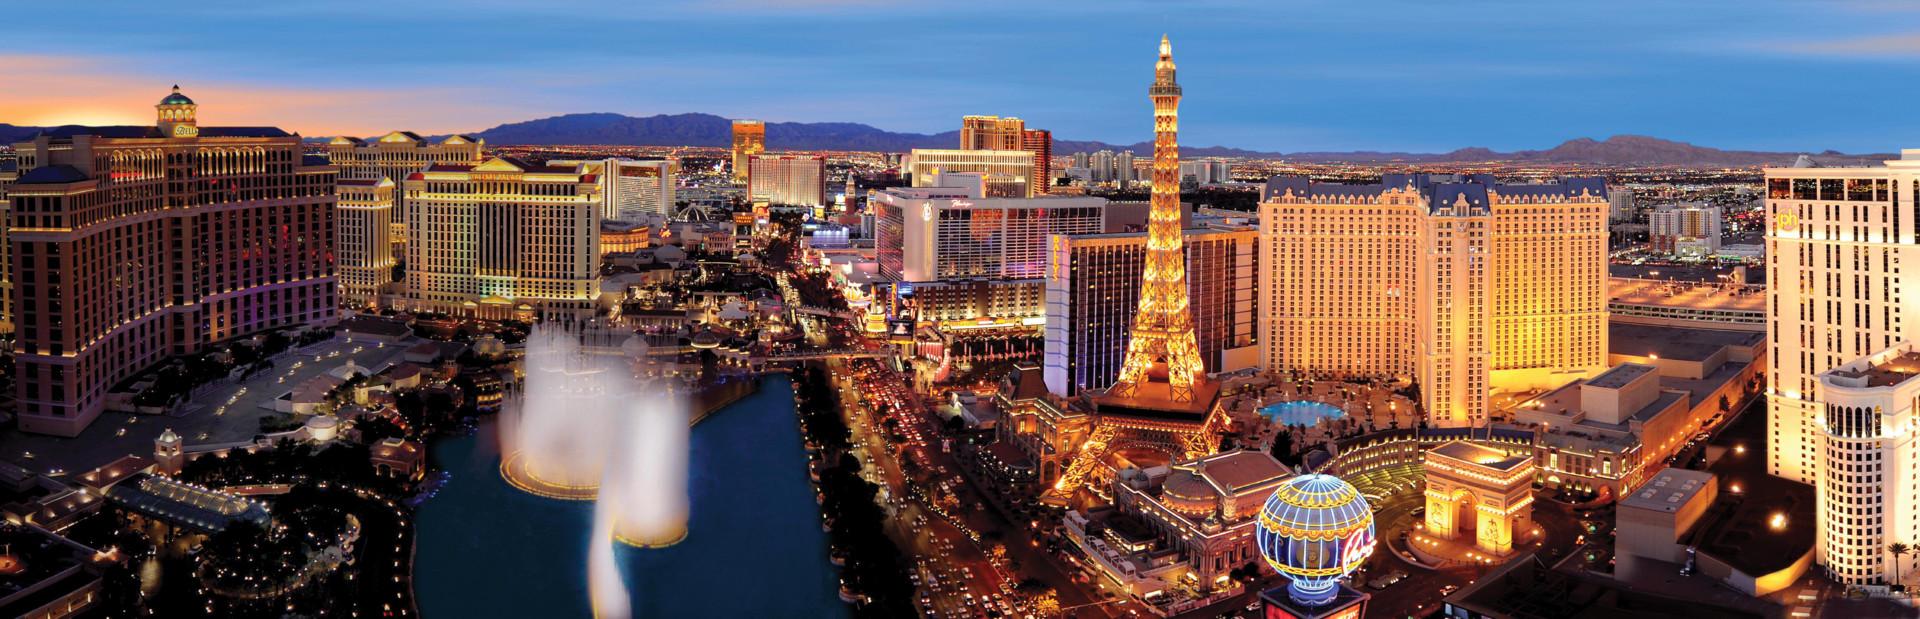 Best casino deals in las vegas 25 casanova casino free jackpots spin